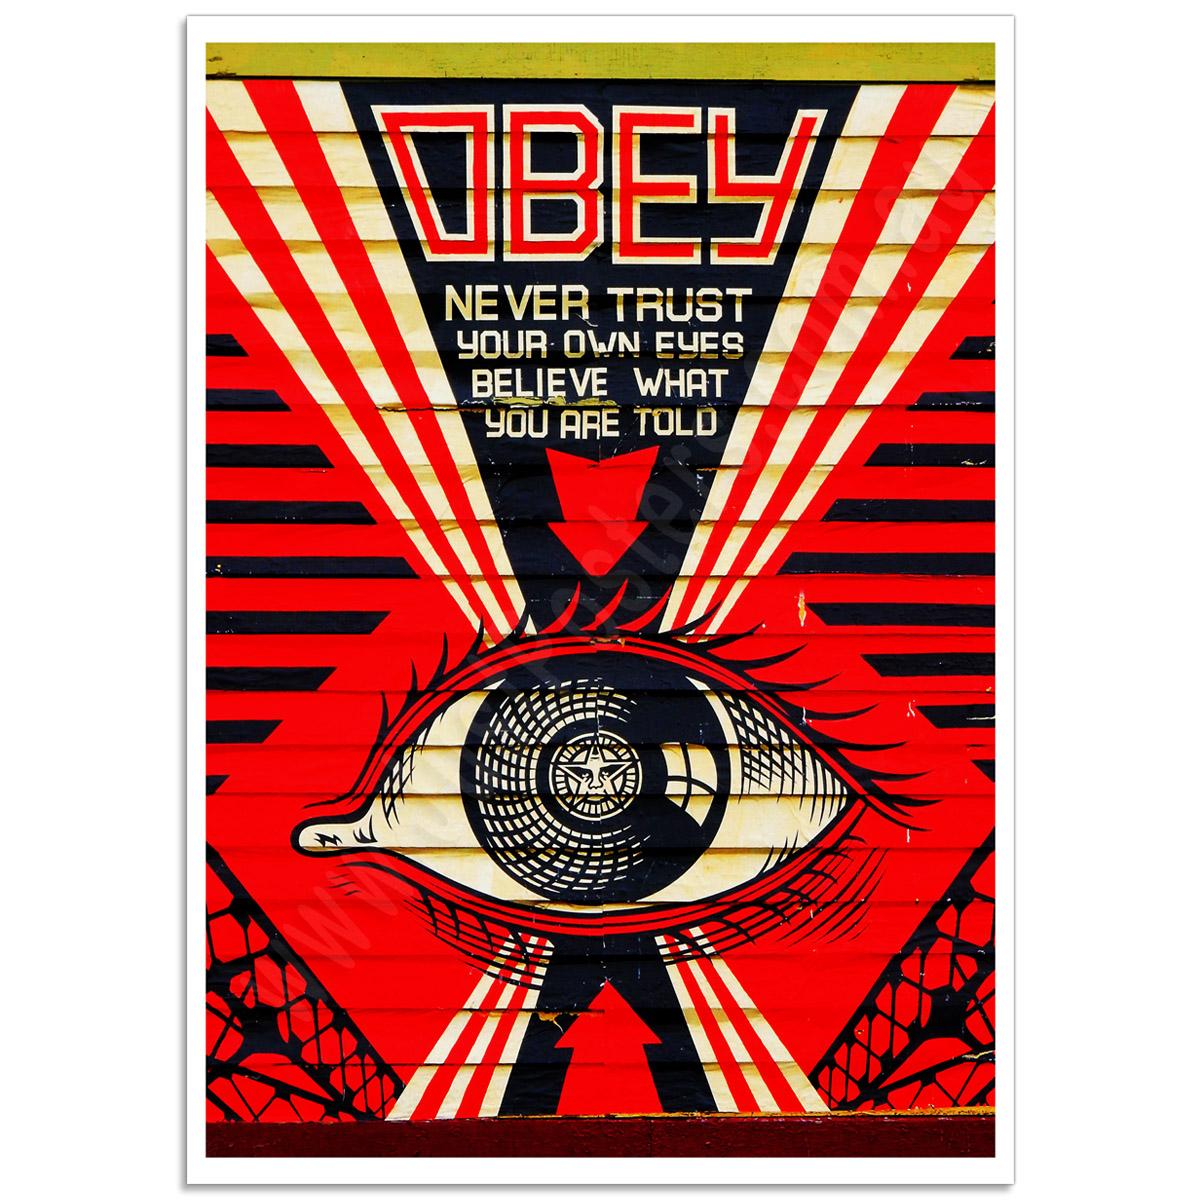 Street Art Poster - Never Trust Your Own Eyes